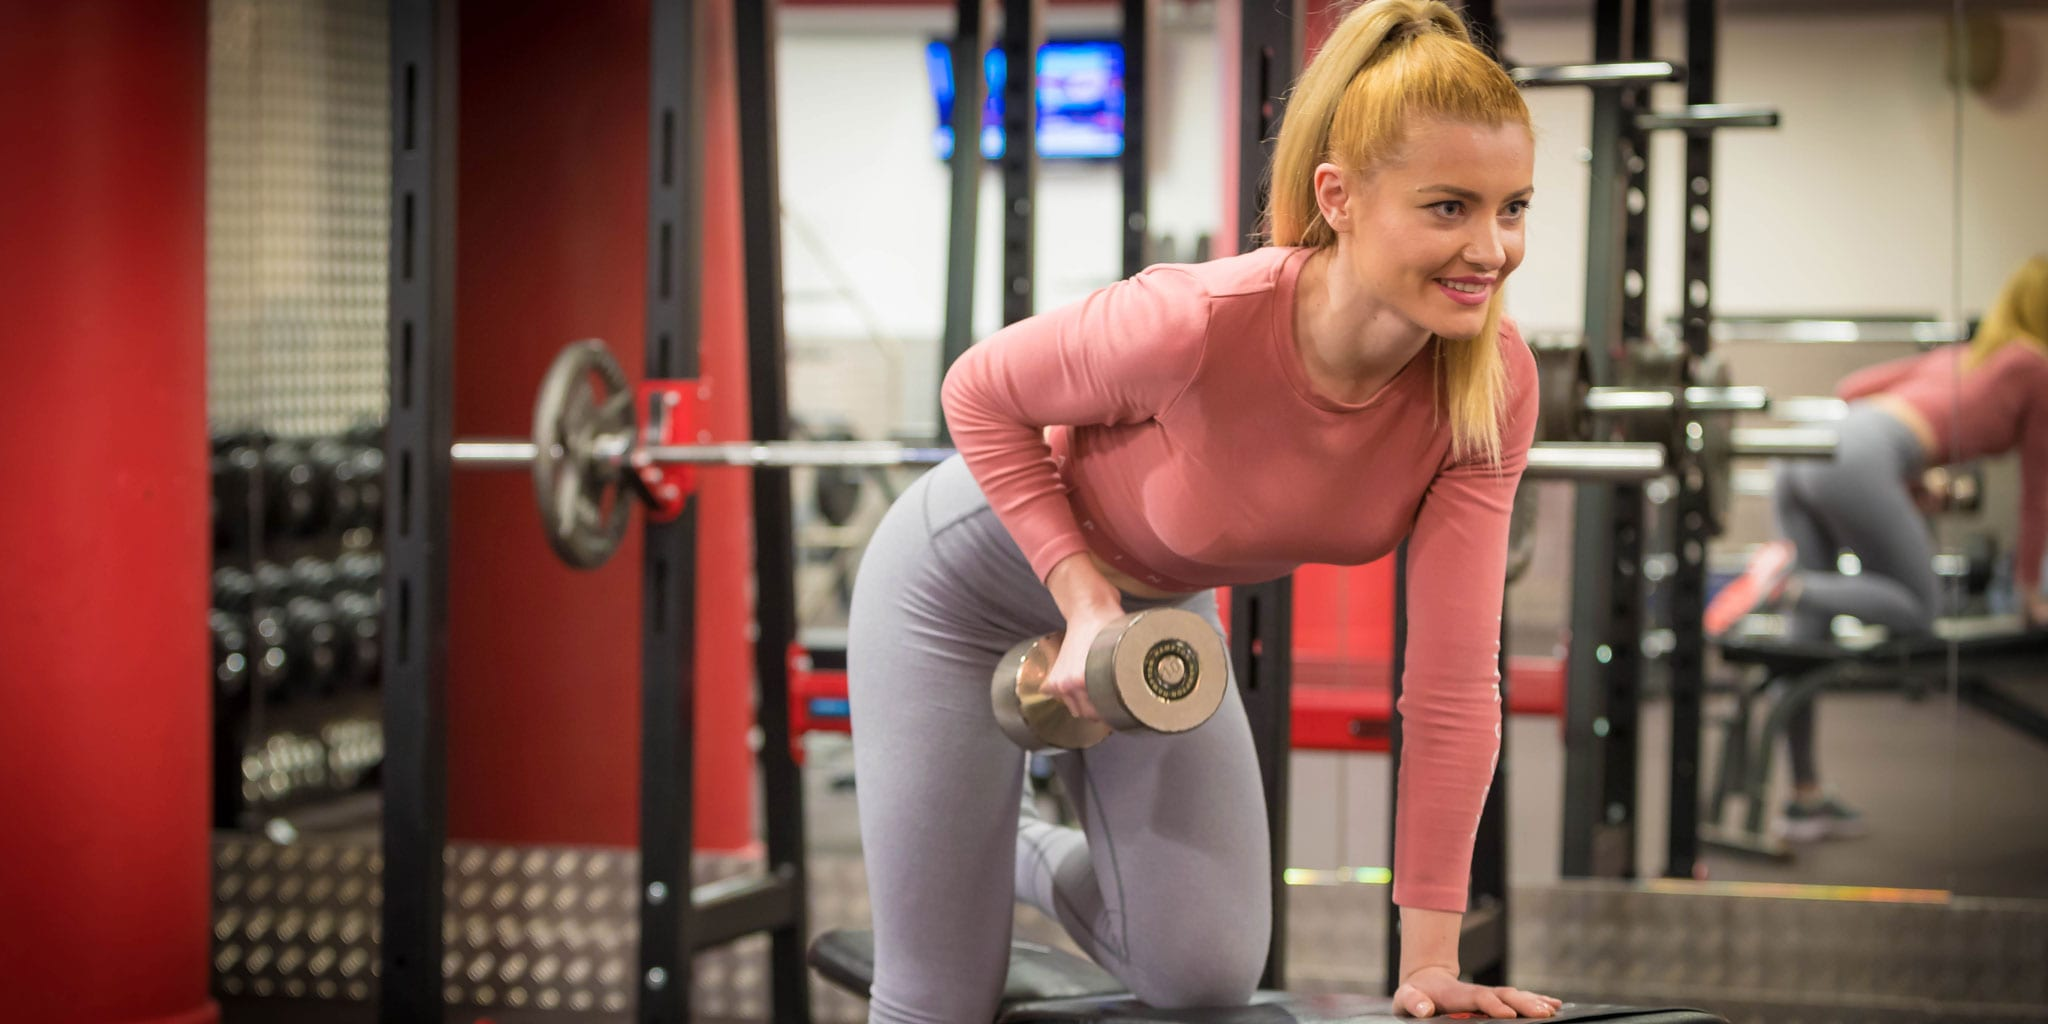 Female-Weights-Club-Vitae-Leisure-Club